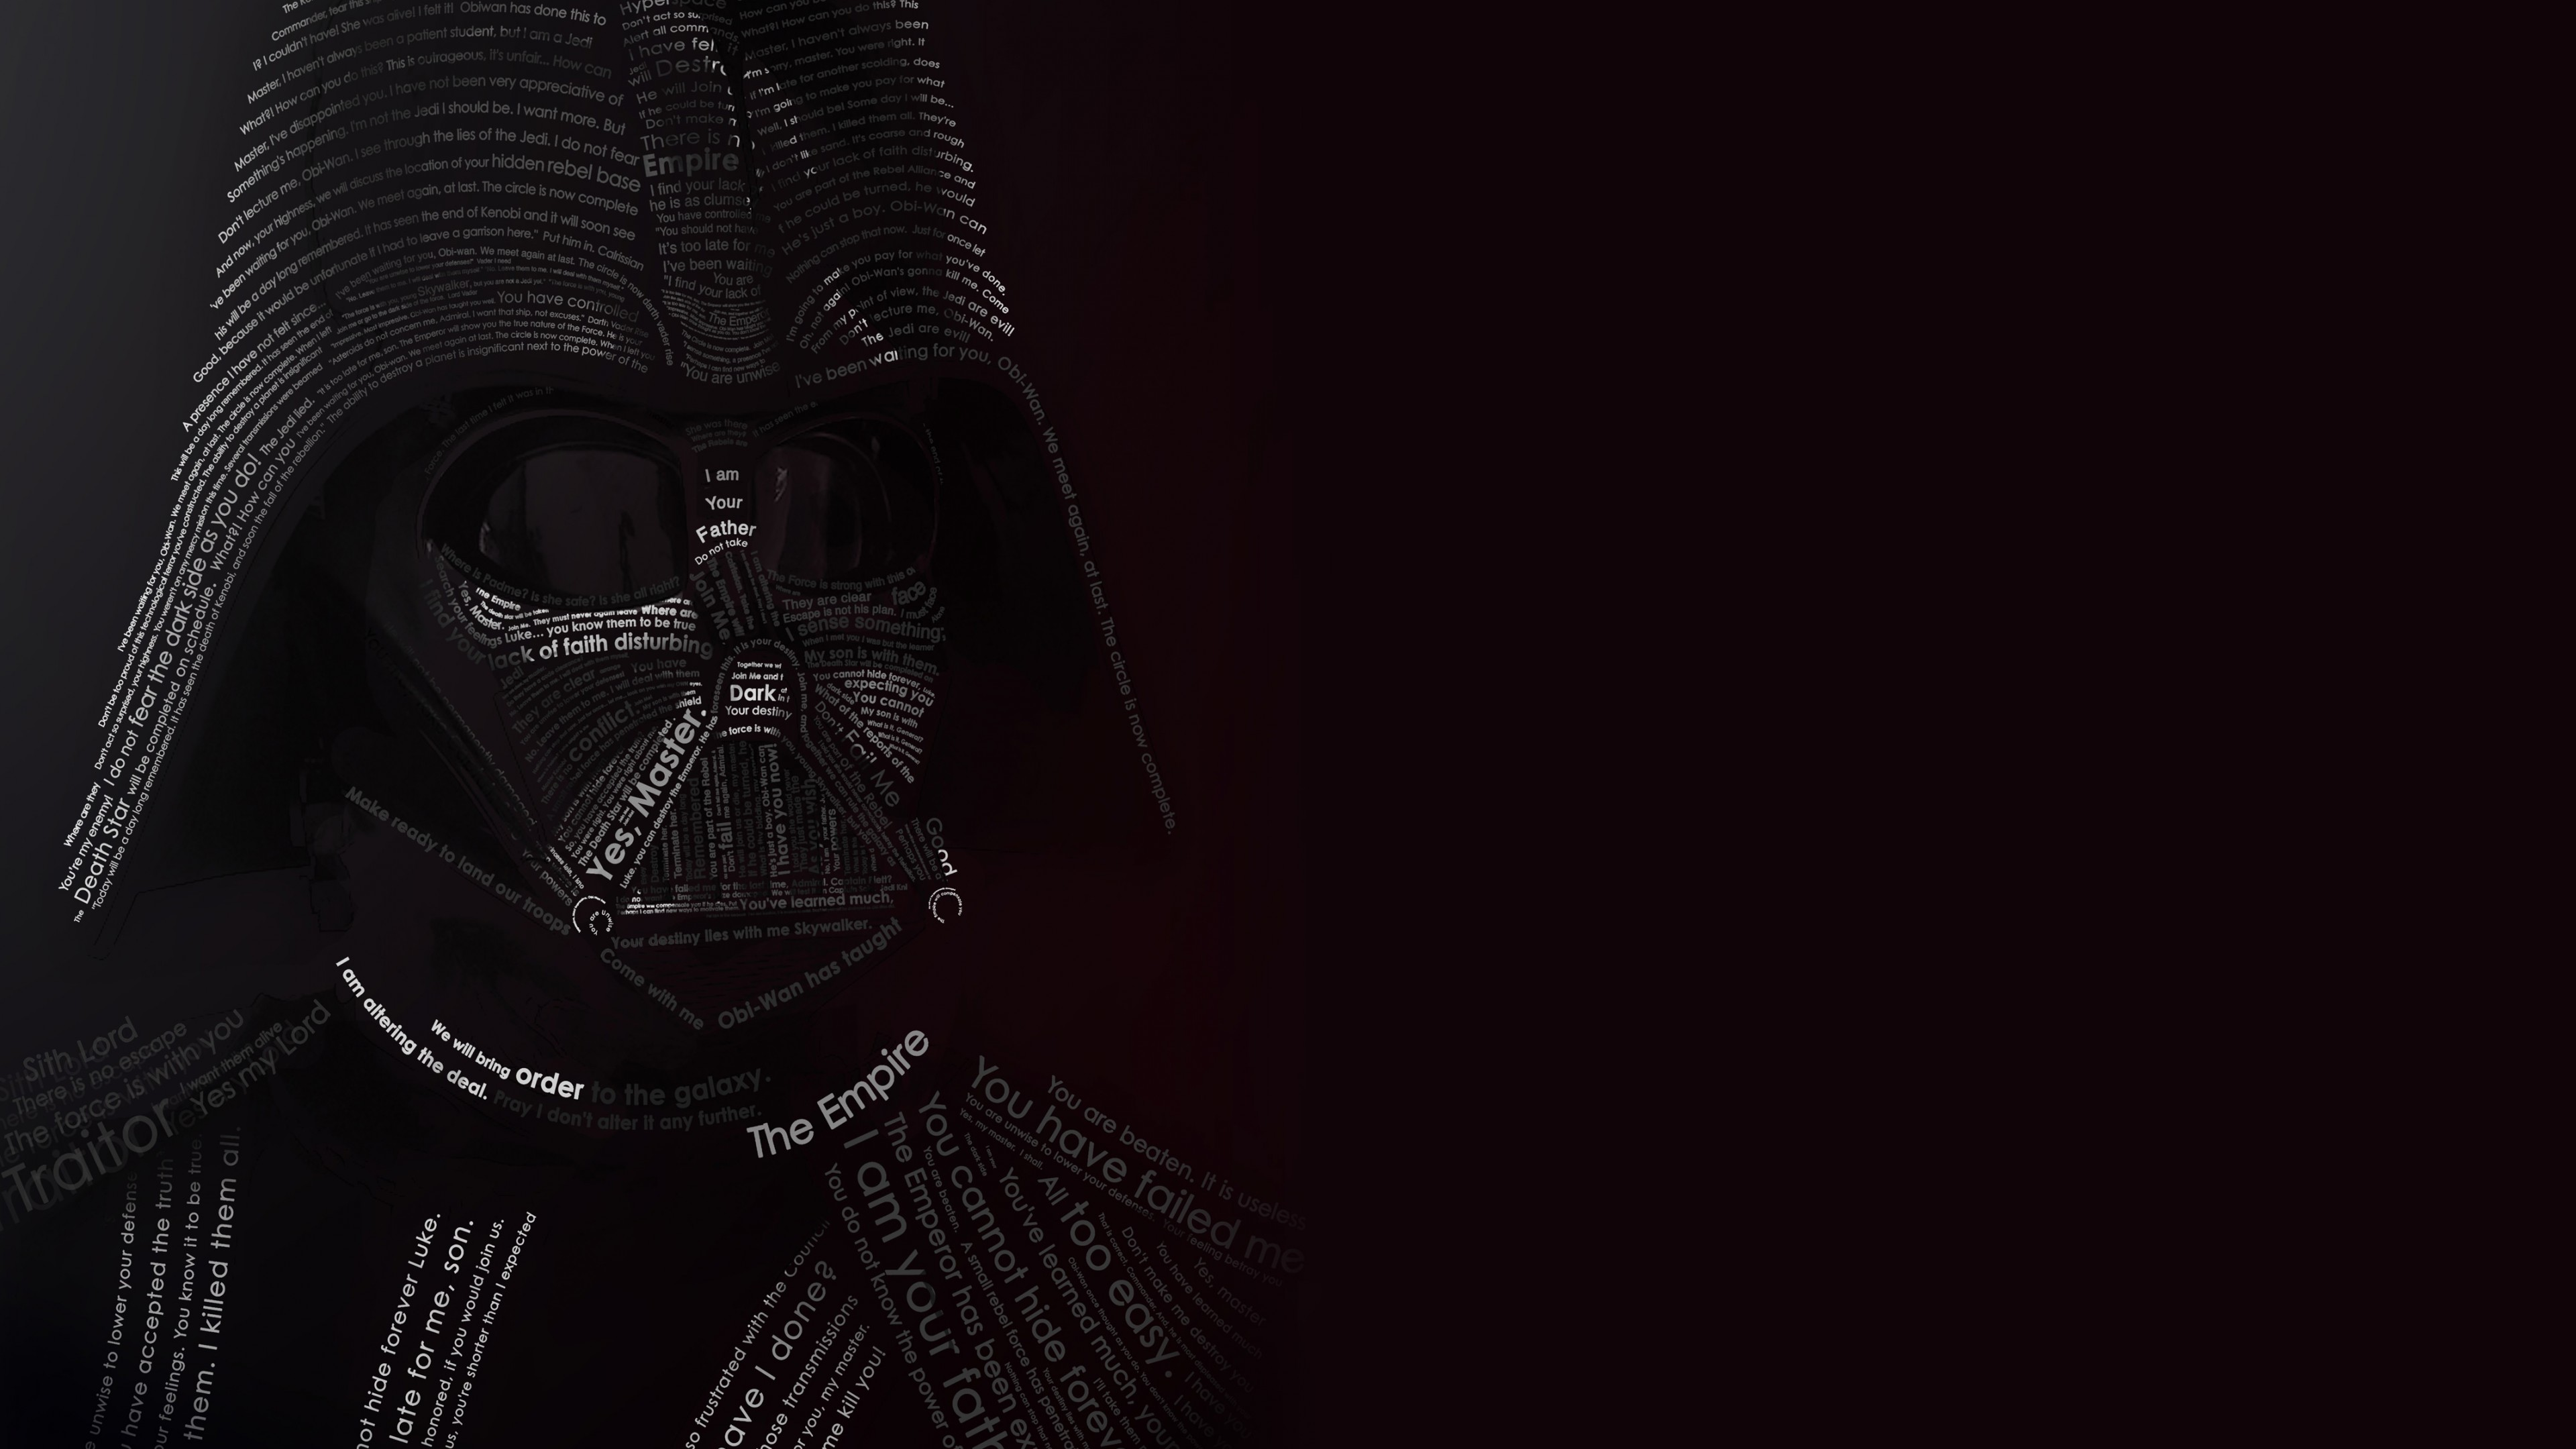 Darth Vader Typographic Portrait Wallpaper for Desktop 4K 3840 x 2160 3840x2160